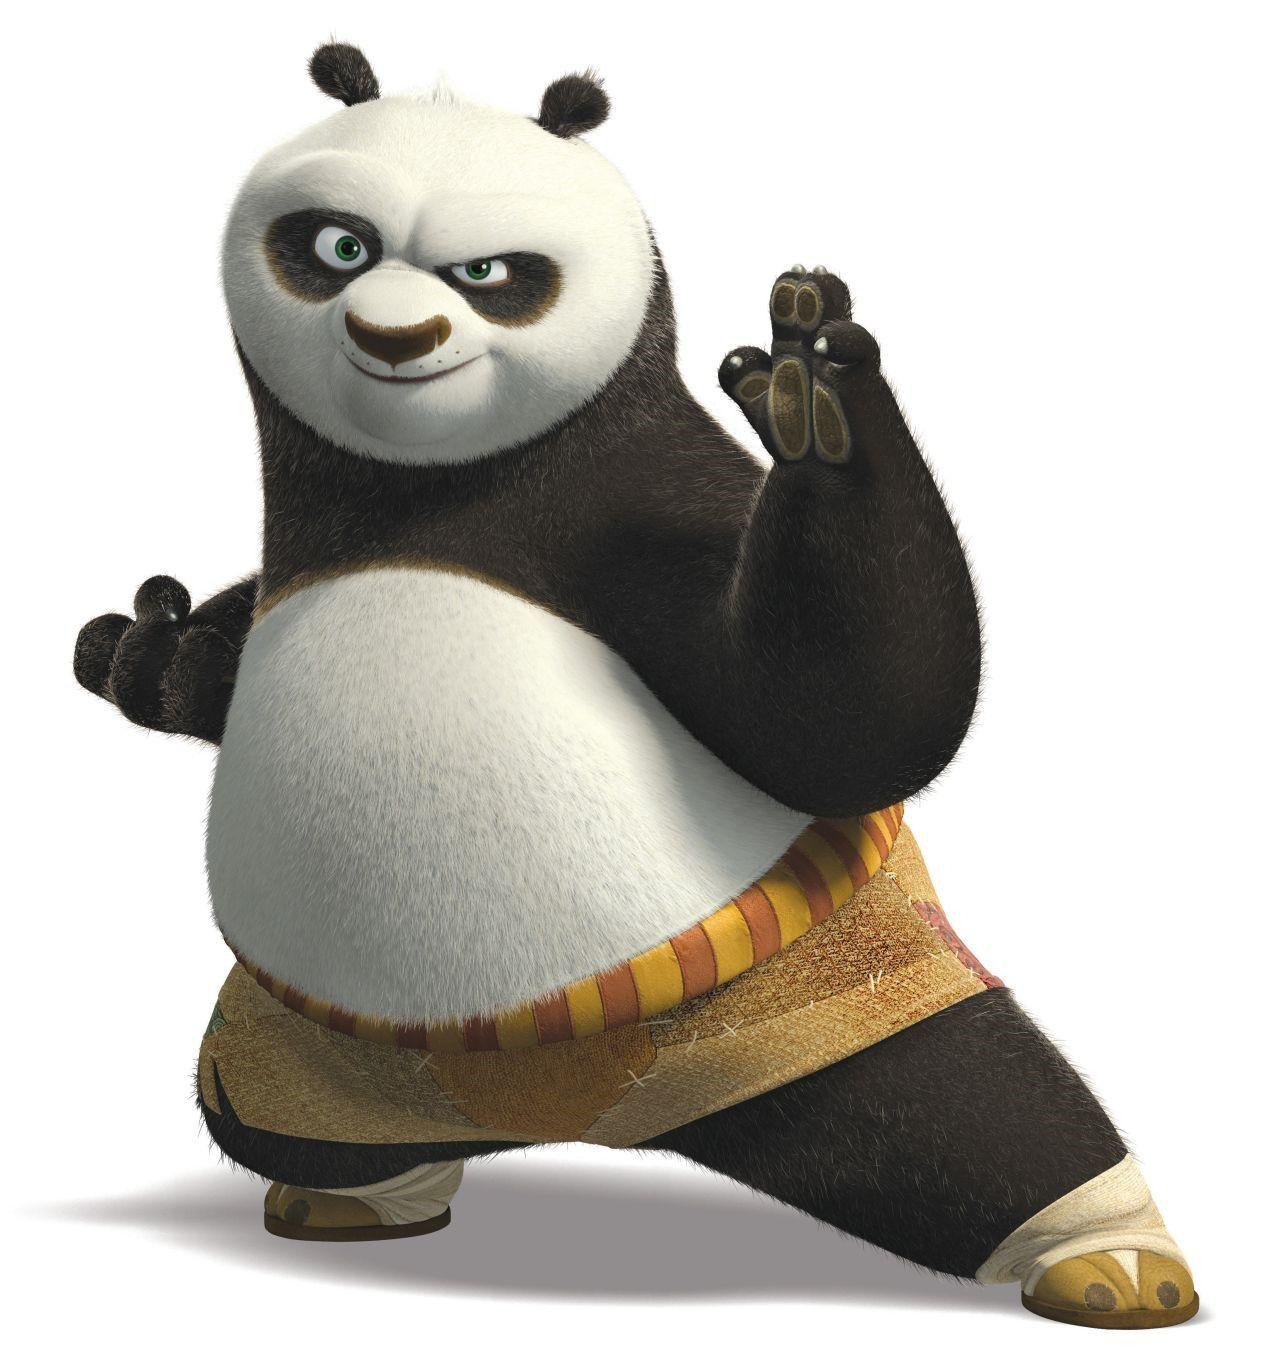 Kung Fu Panda 2 Officiel Kung Fu Panda 3 Animation Et